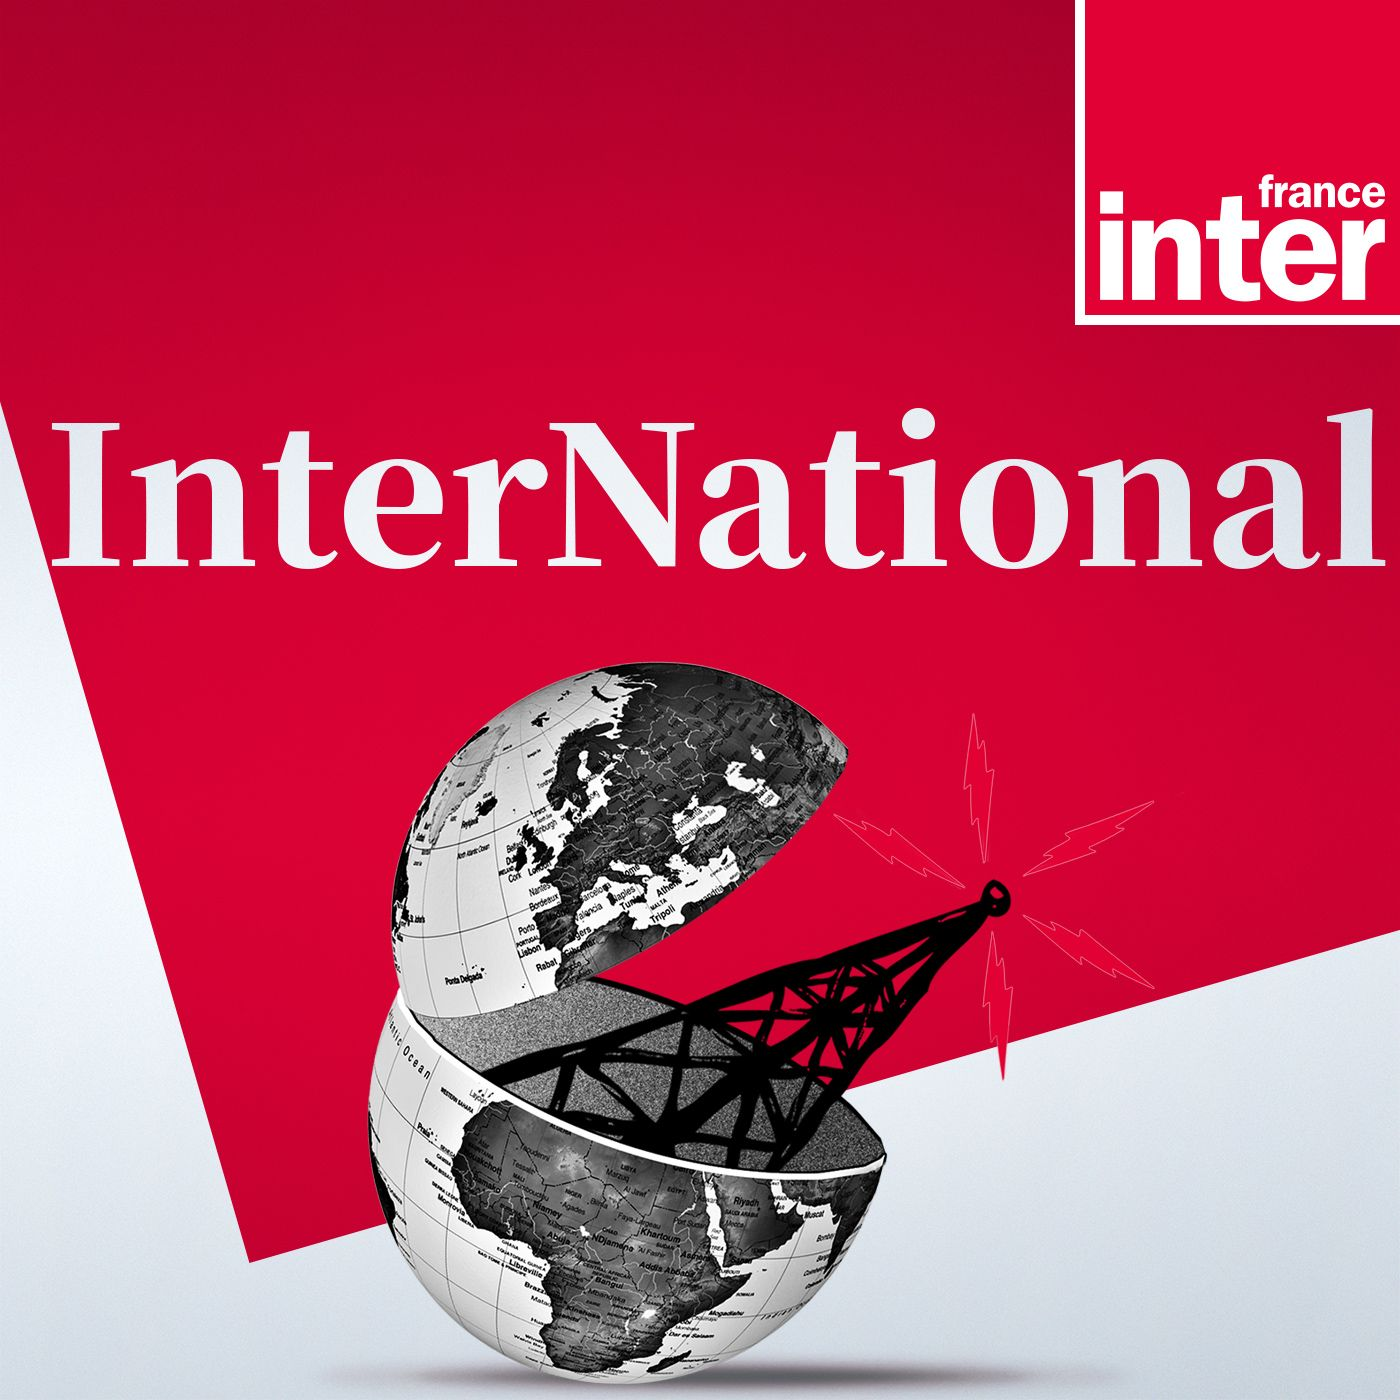 Image 1: InterNational